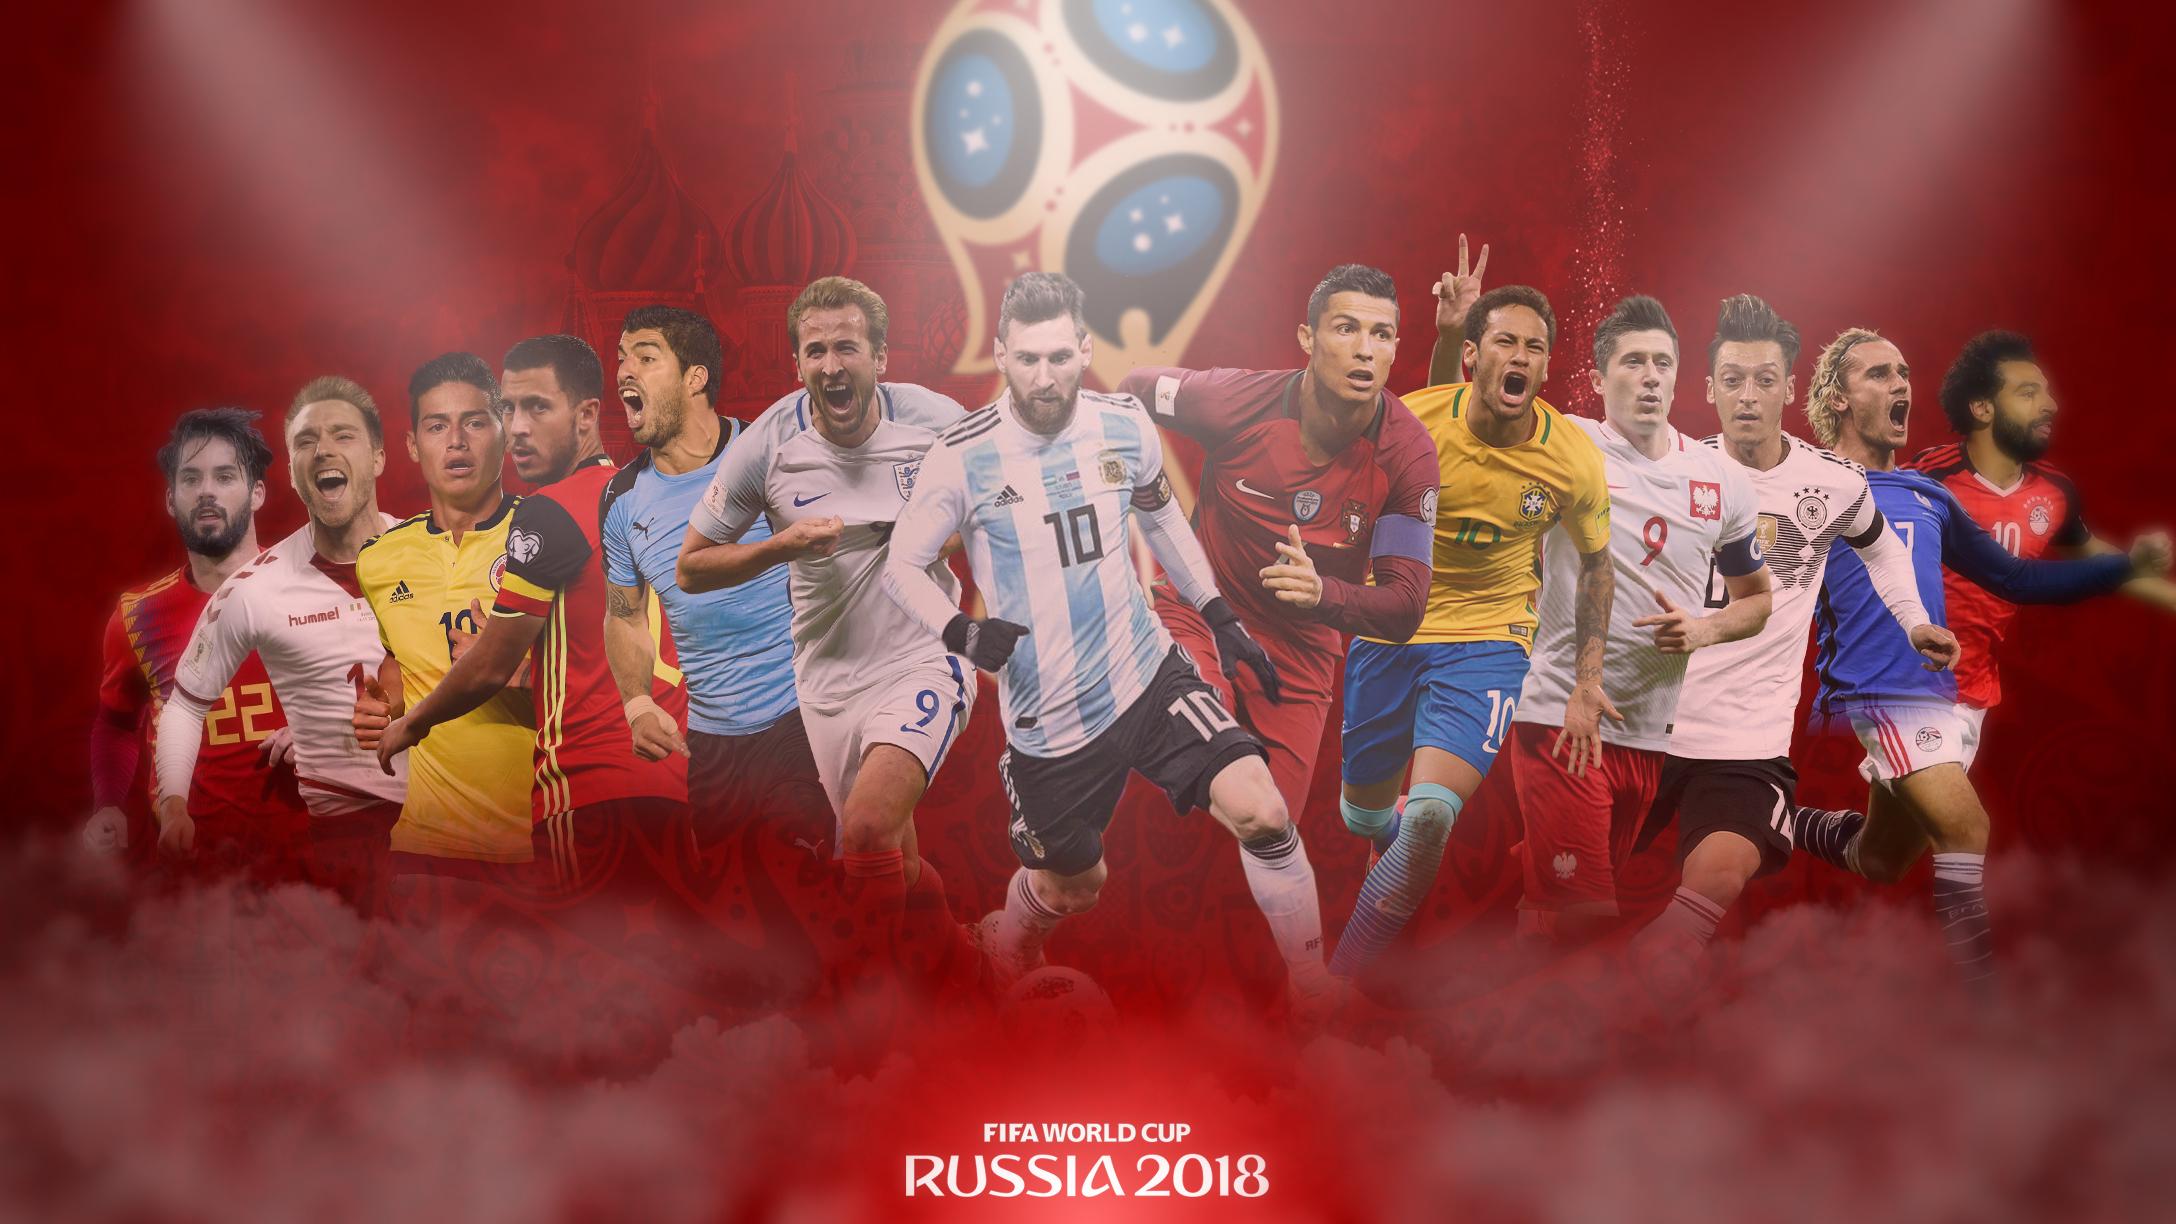 FIFA World cup 2018 Russia Desktop Wallpaper by GraphicSamHD